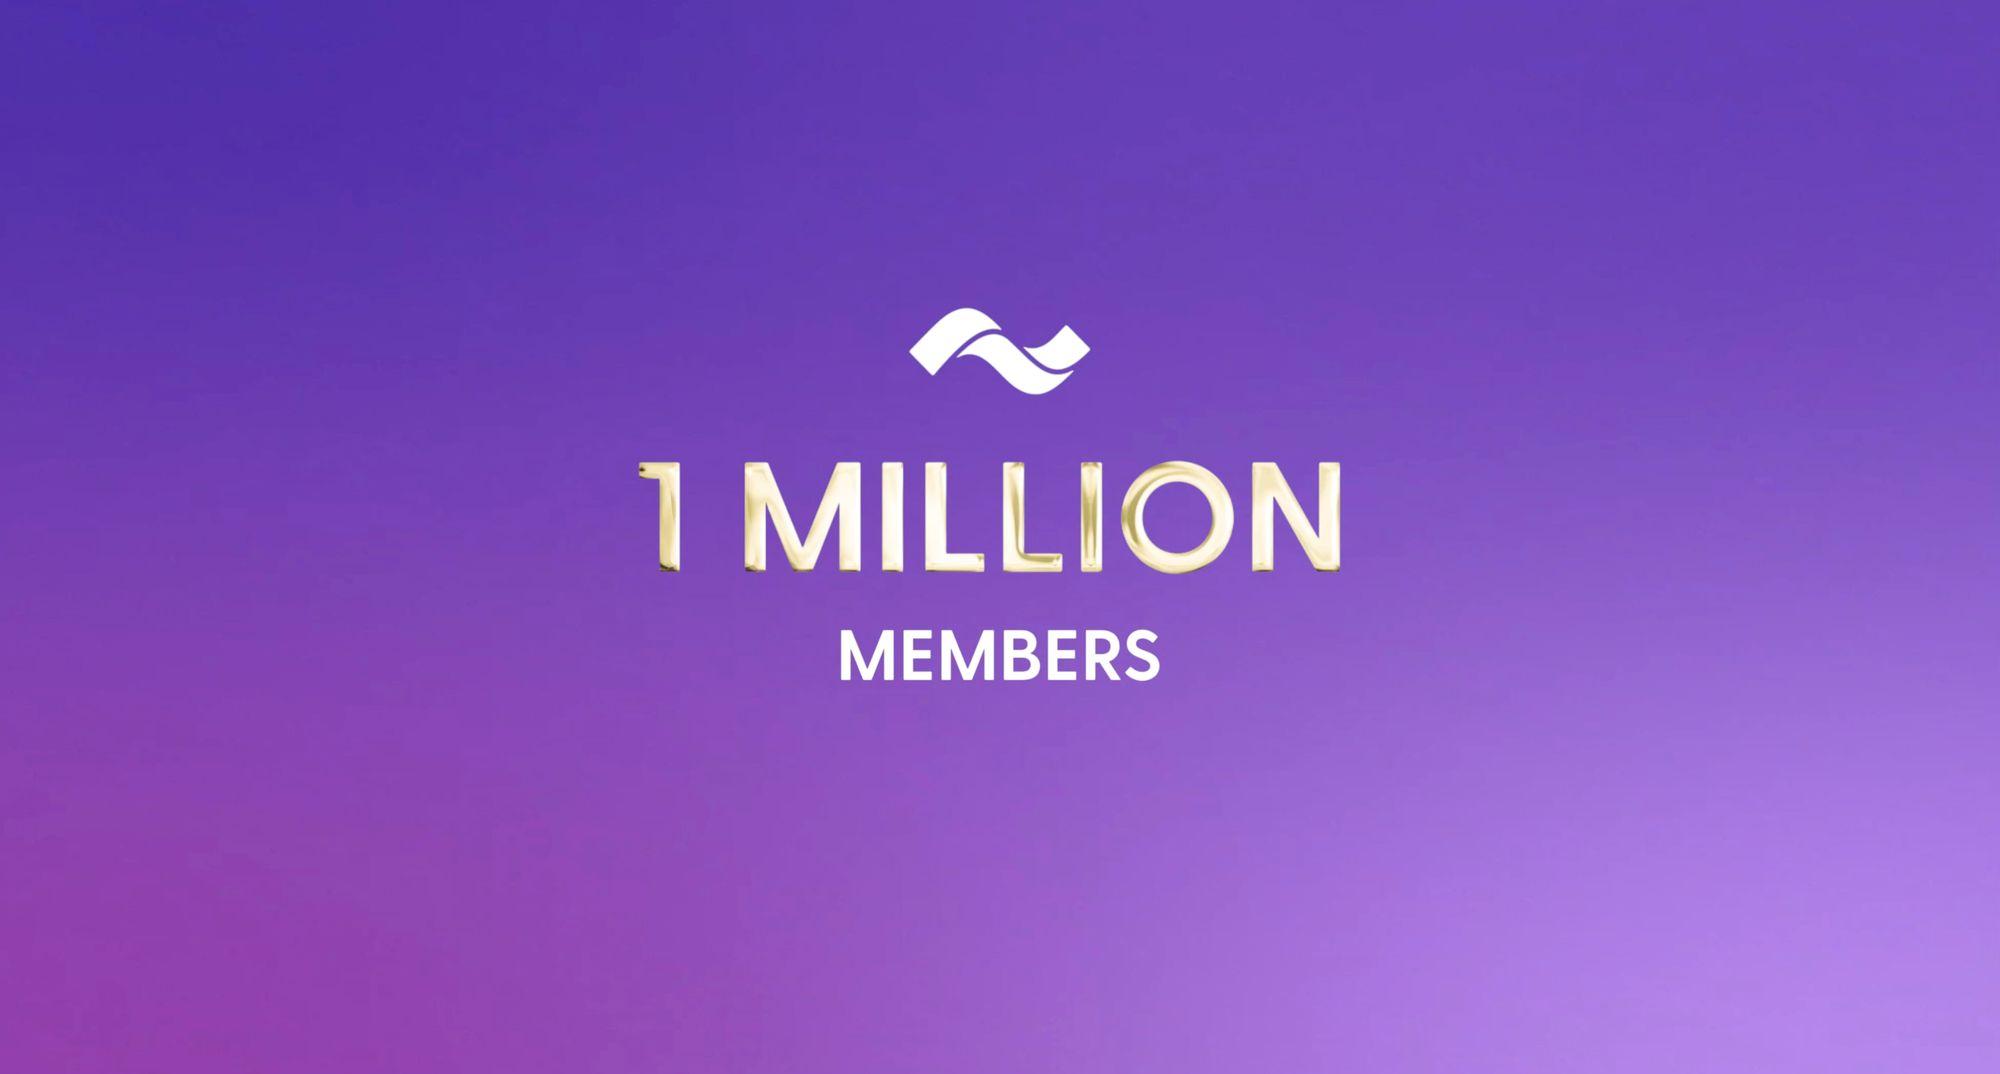 current-bank-surpasses-1-million-members-raises-additional-funding